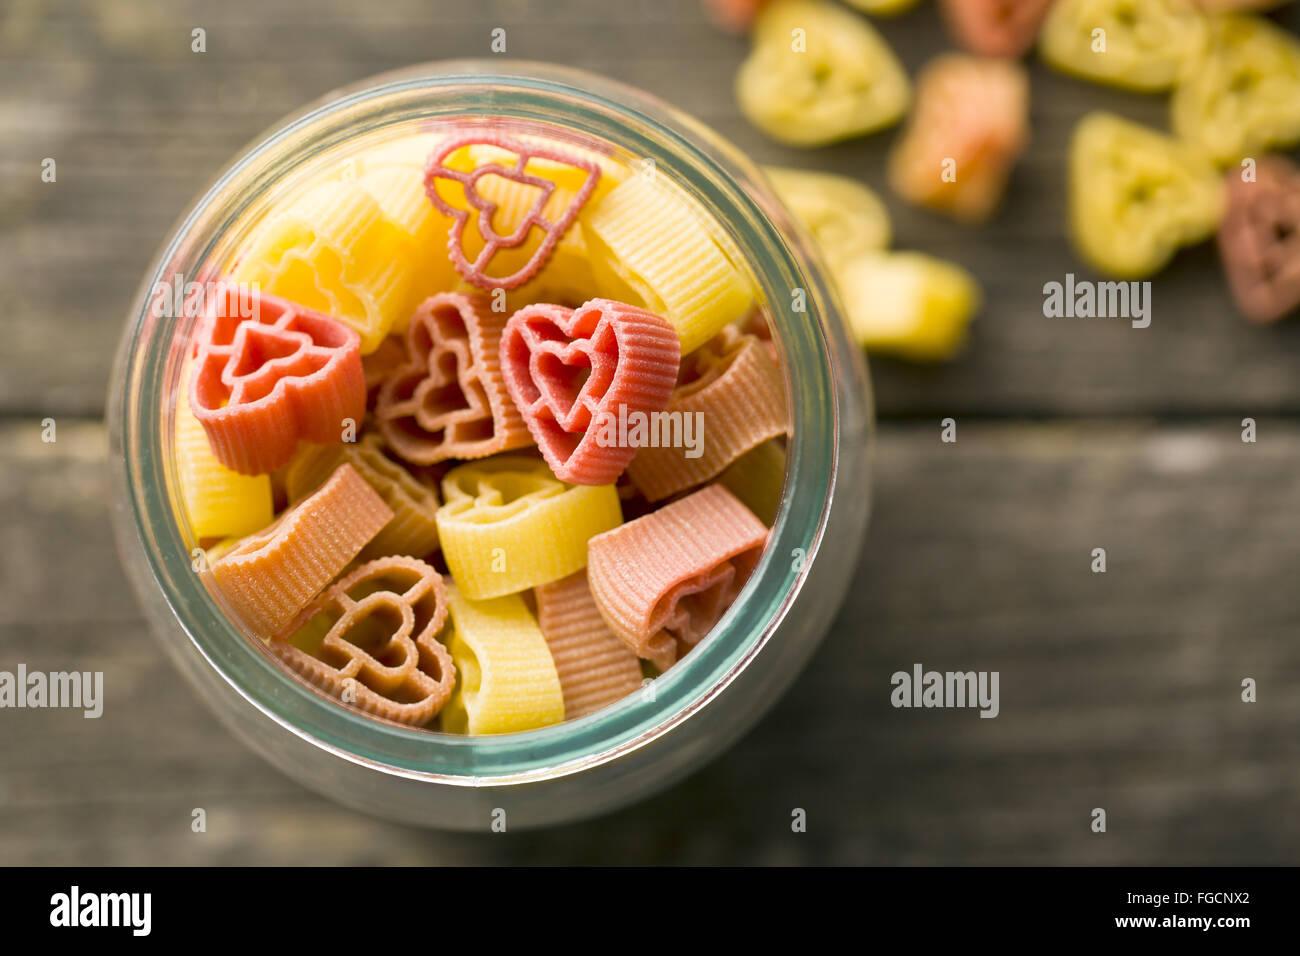 Vue de dessus de pâtes en forme de coeur dans le jar Photo Stock